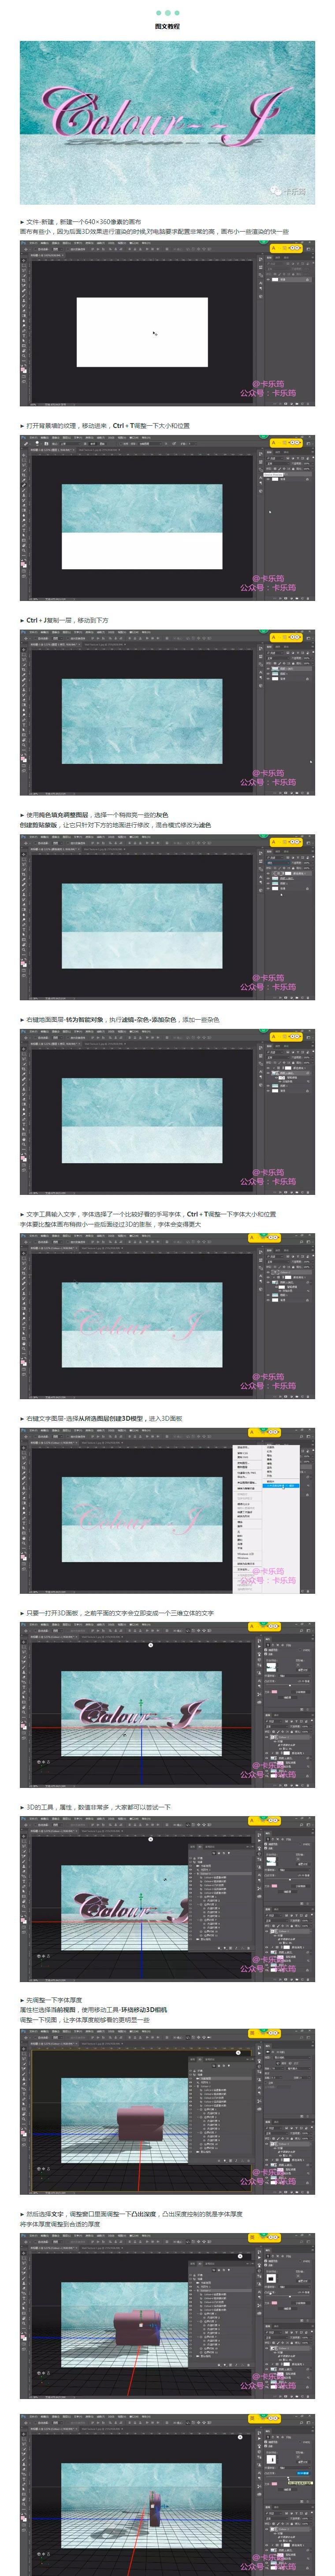 Photoshop制作简约风格的3D立体字,PS教程,思缘教程网